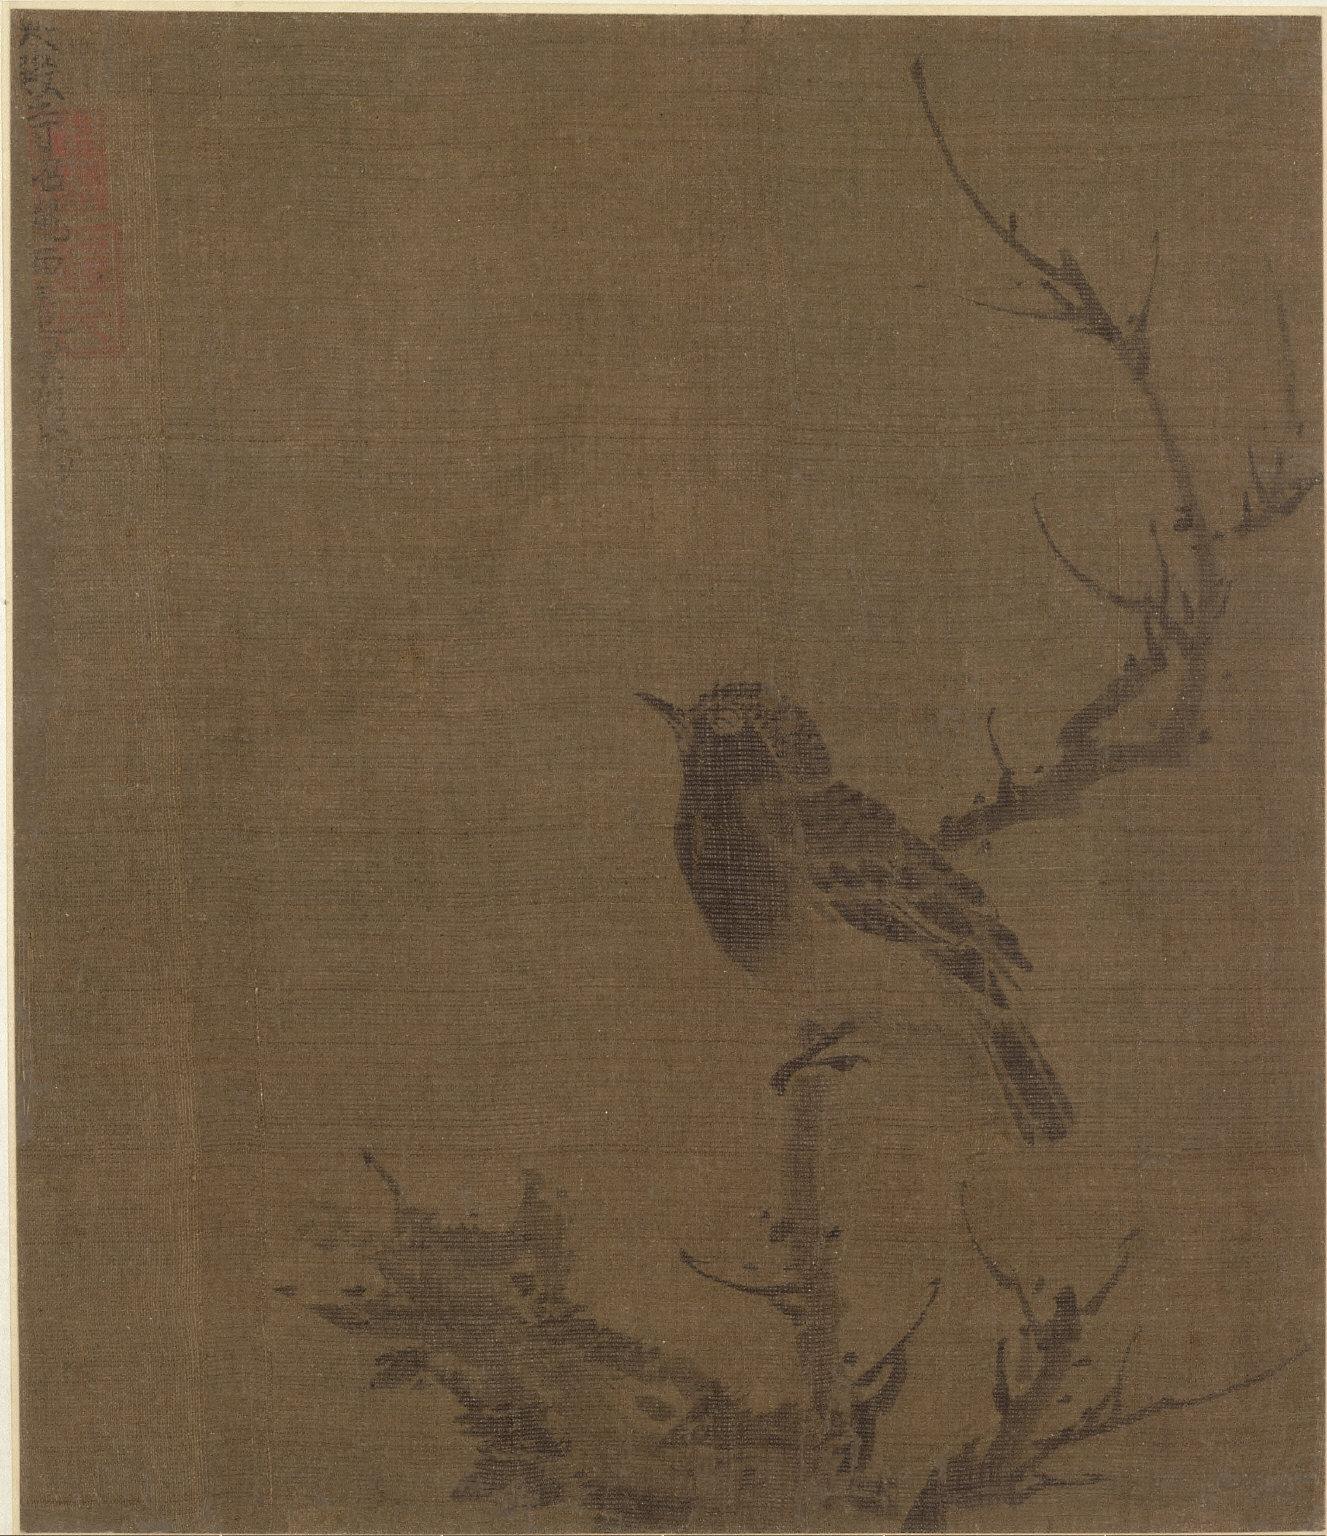 Sleeping Bird on a Prunus Branch